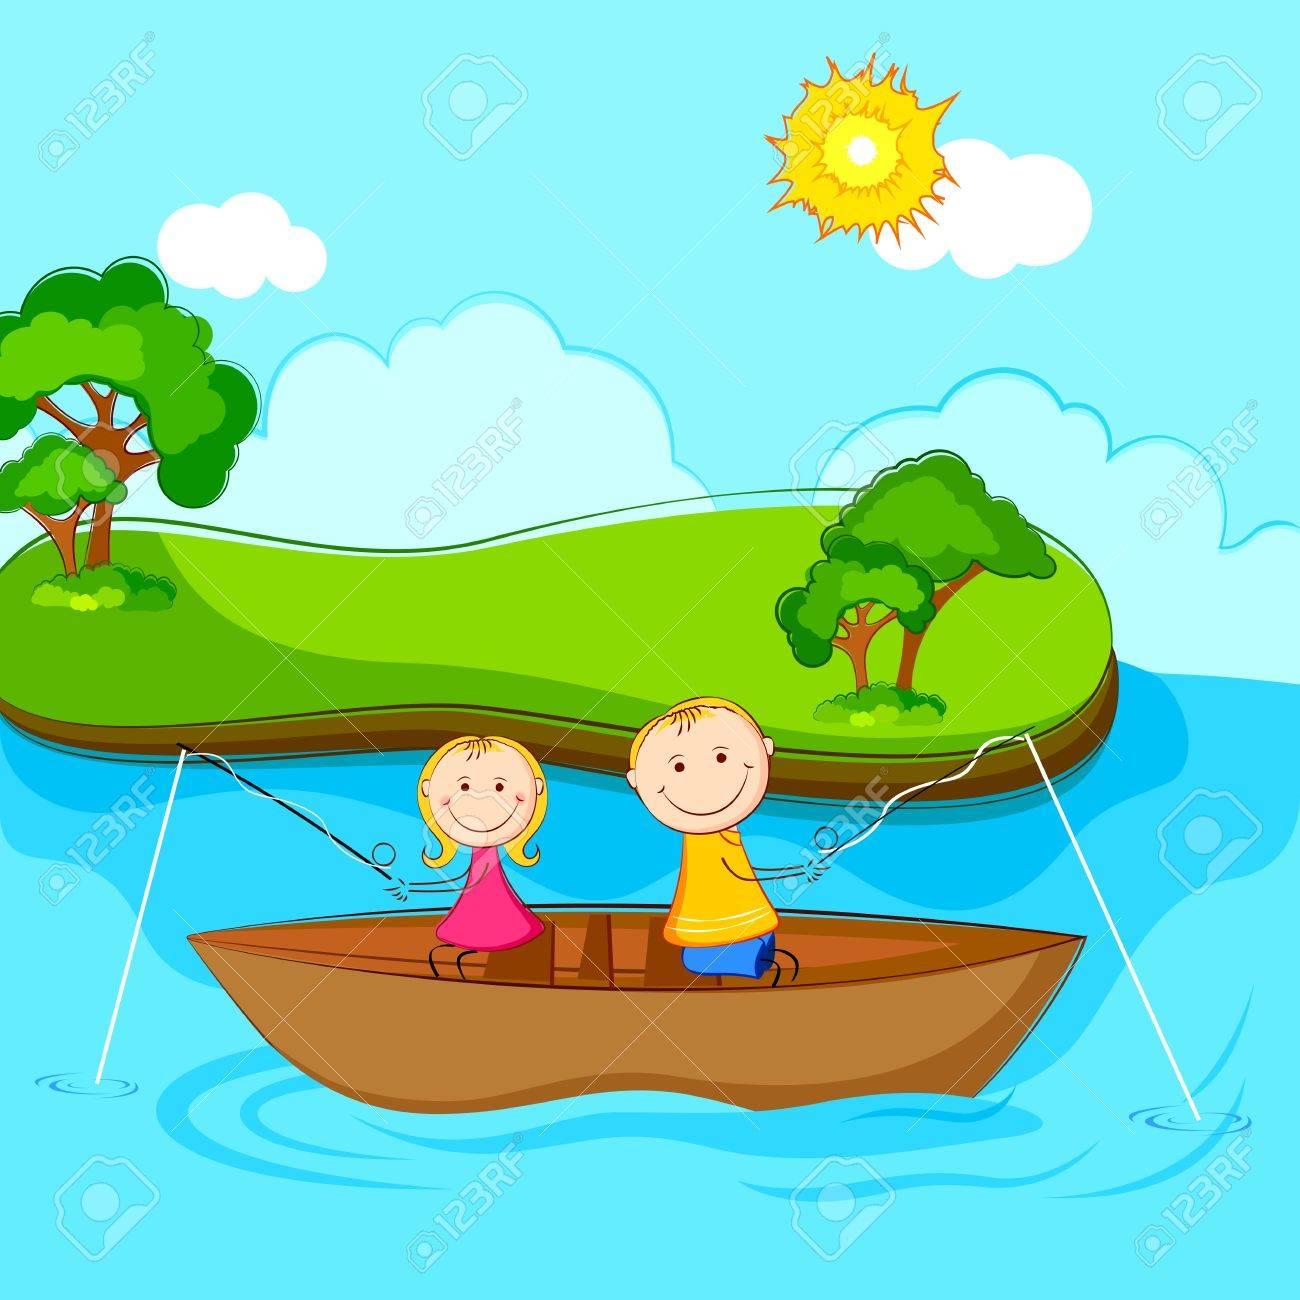 illustration of kids sitting in boat doing fishing.